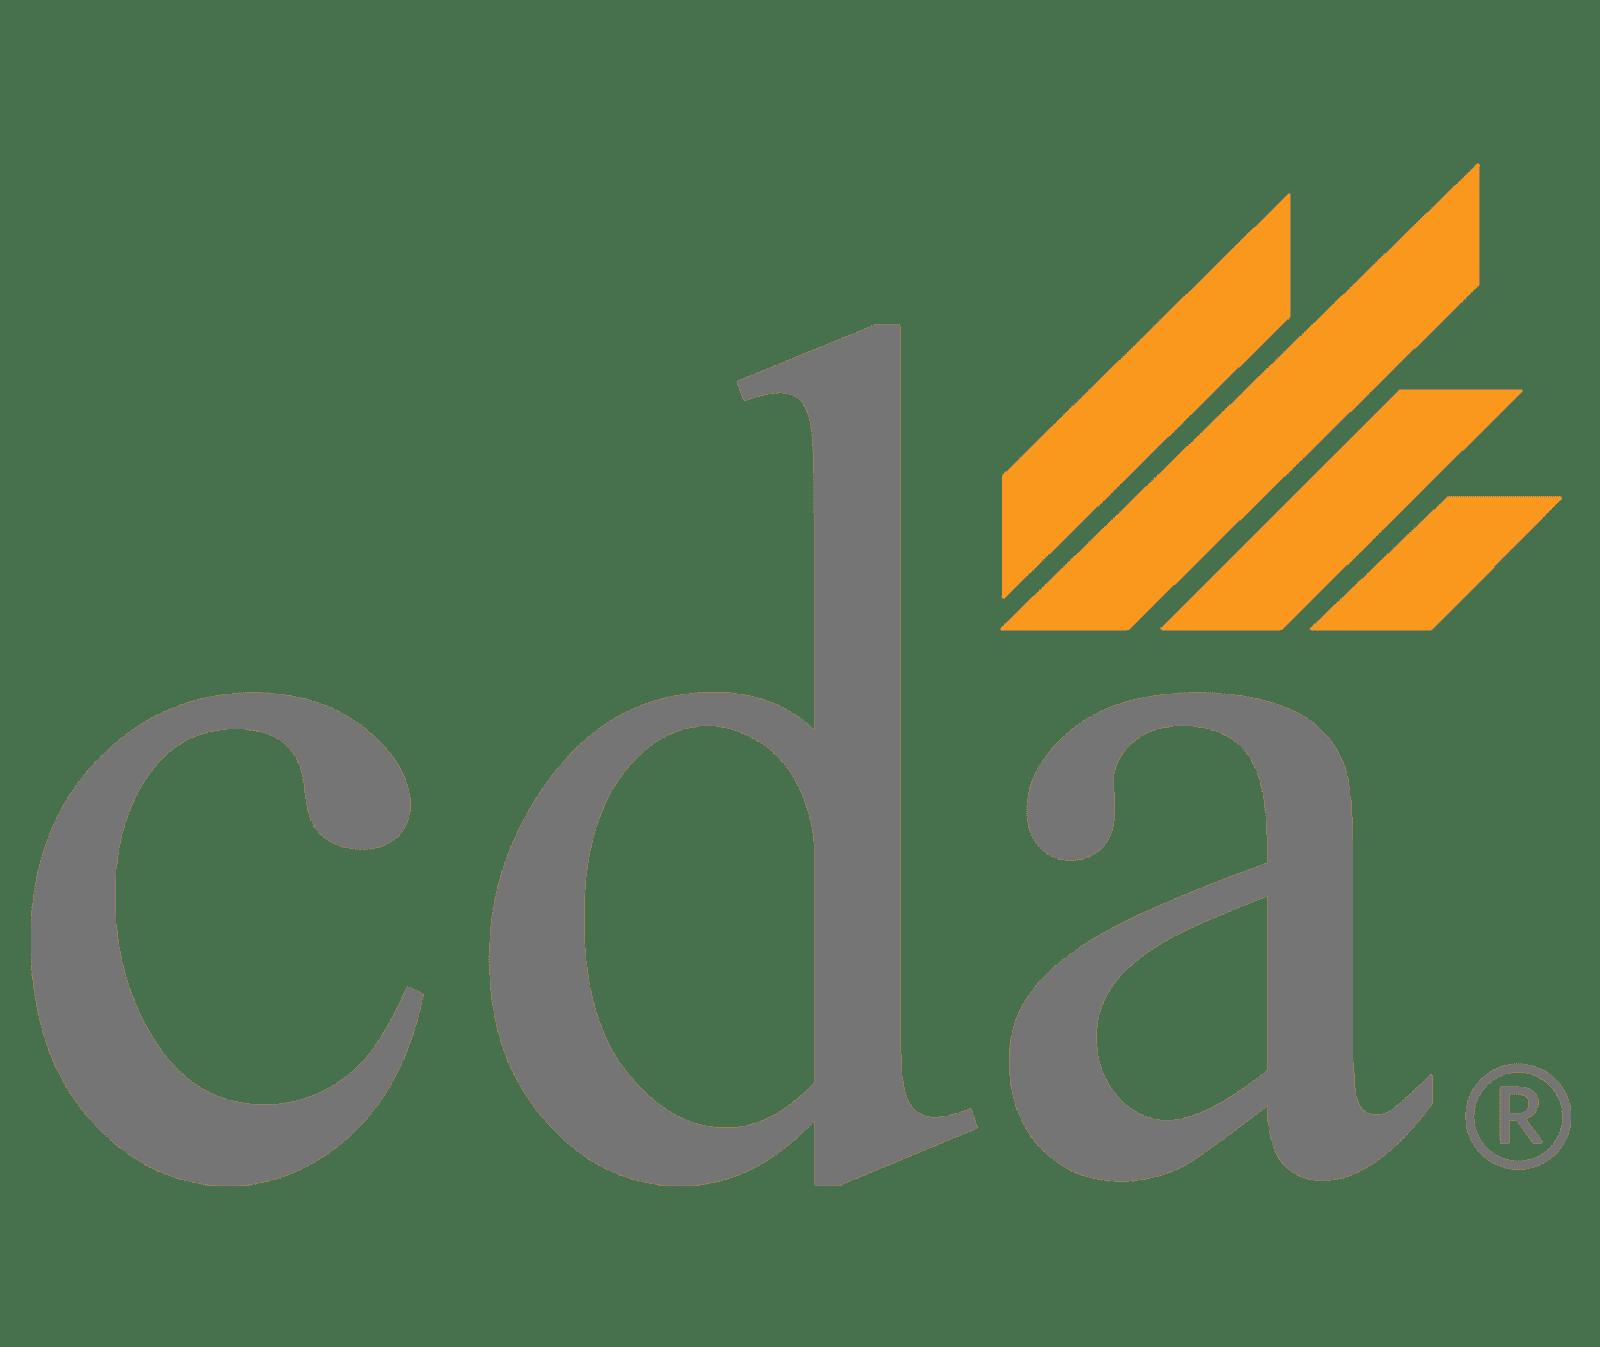 cda california dental association logo